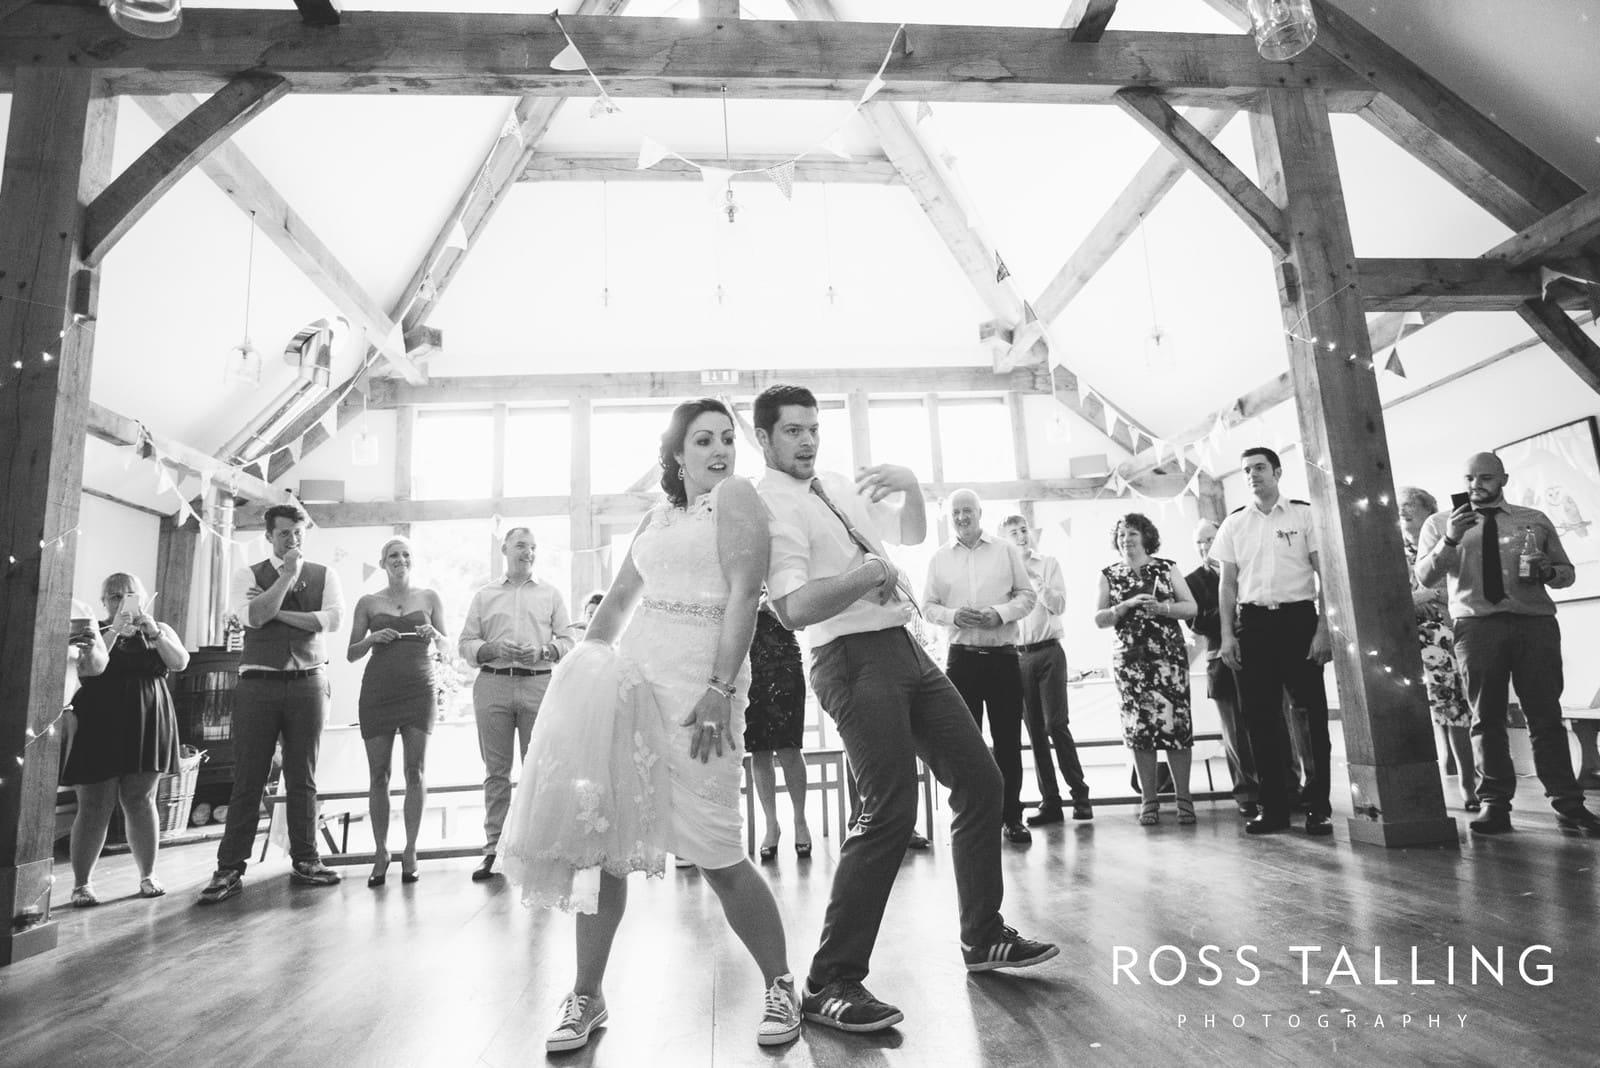 Coolest First Dance Ever Breakdancing Bride and Groom Jasmin and Ben Barnicoat_0004